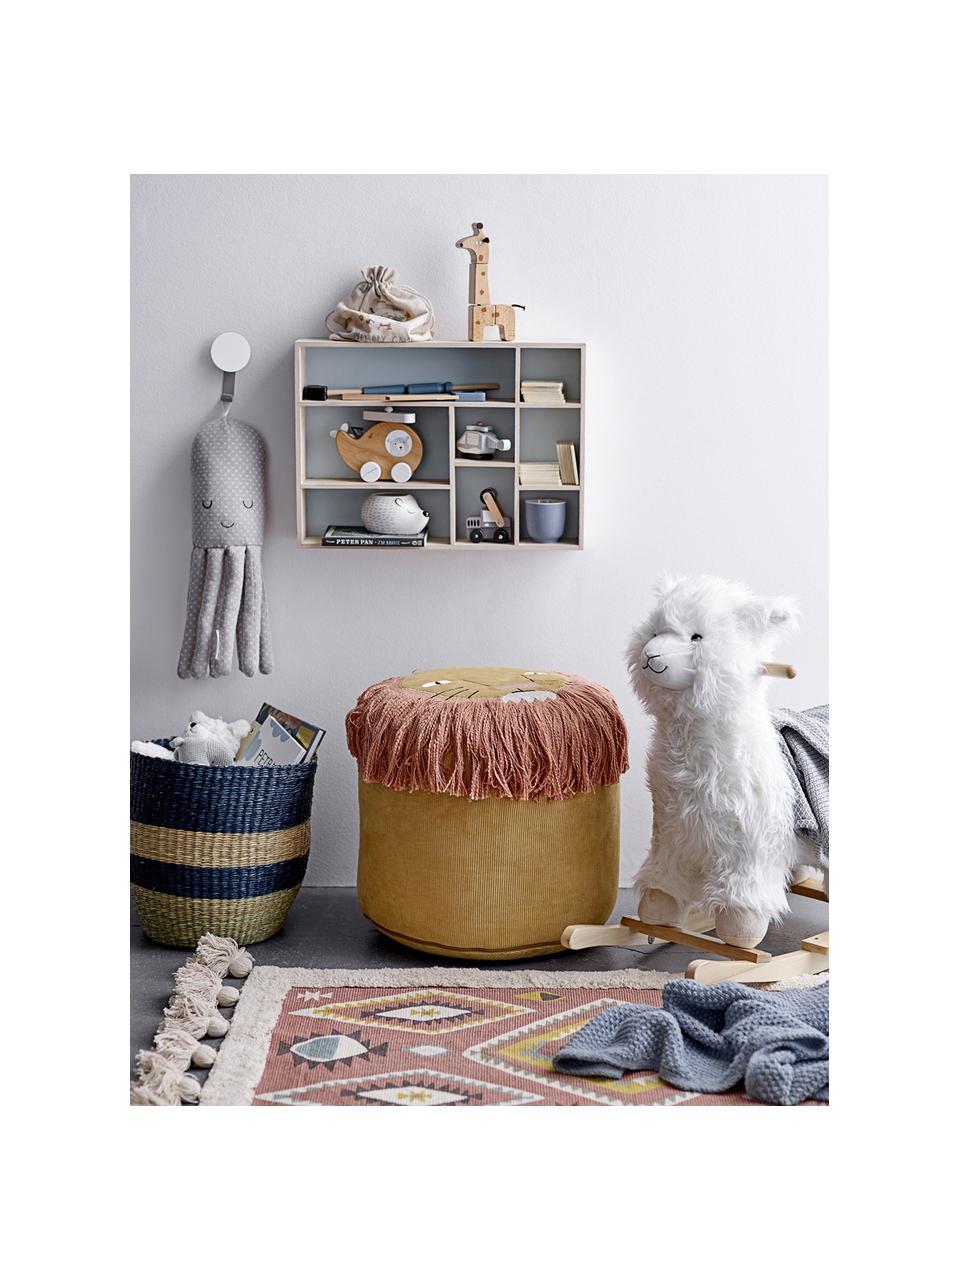 Vloerkleed Boho, 100% katoen, Multicolour, B 70 x L 120 cm (maat XS)